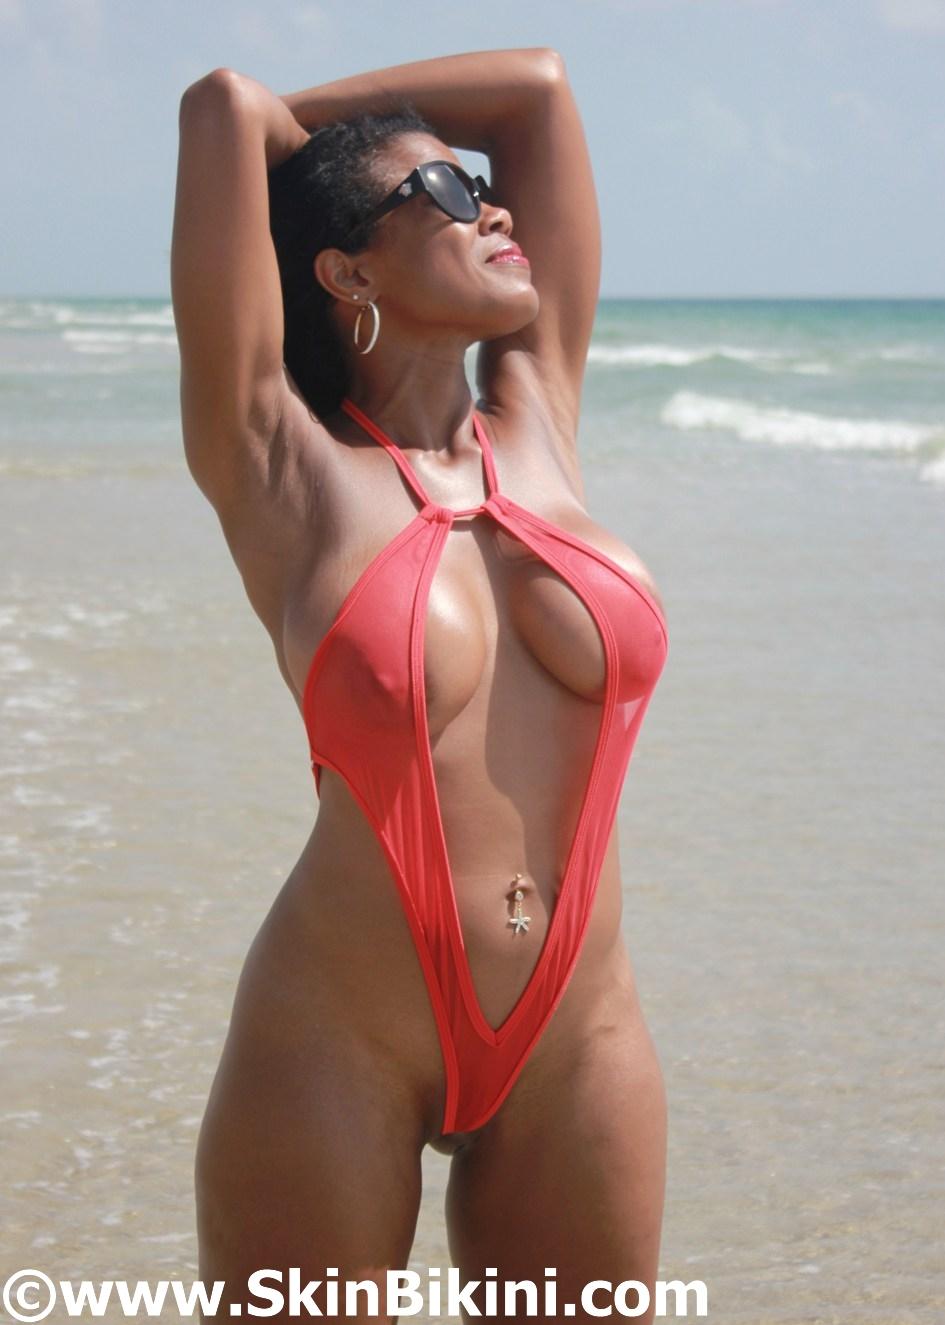 Sexy see-thru front open mesh monokini from skinbikini.com